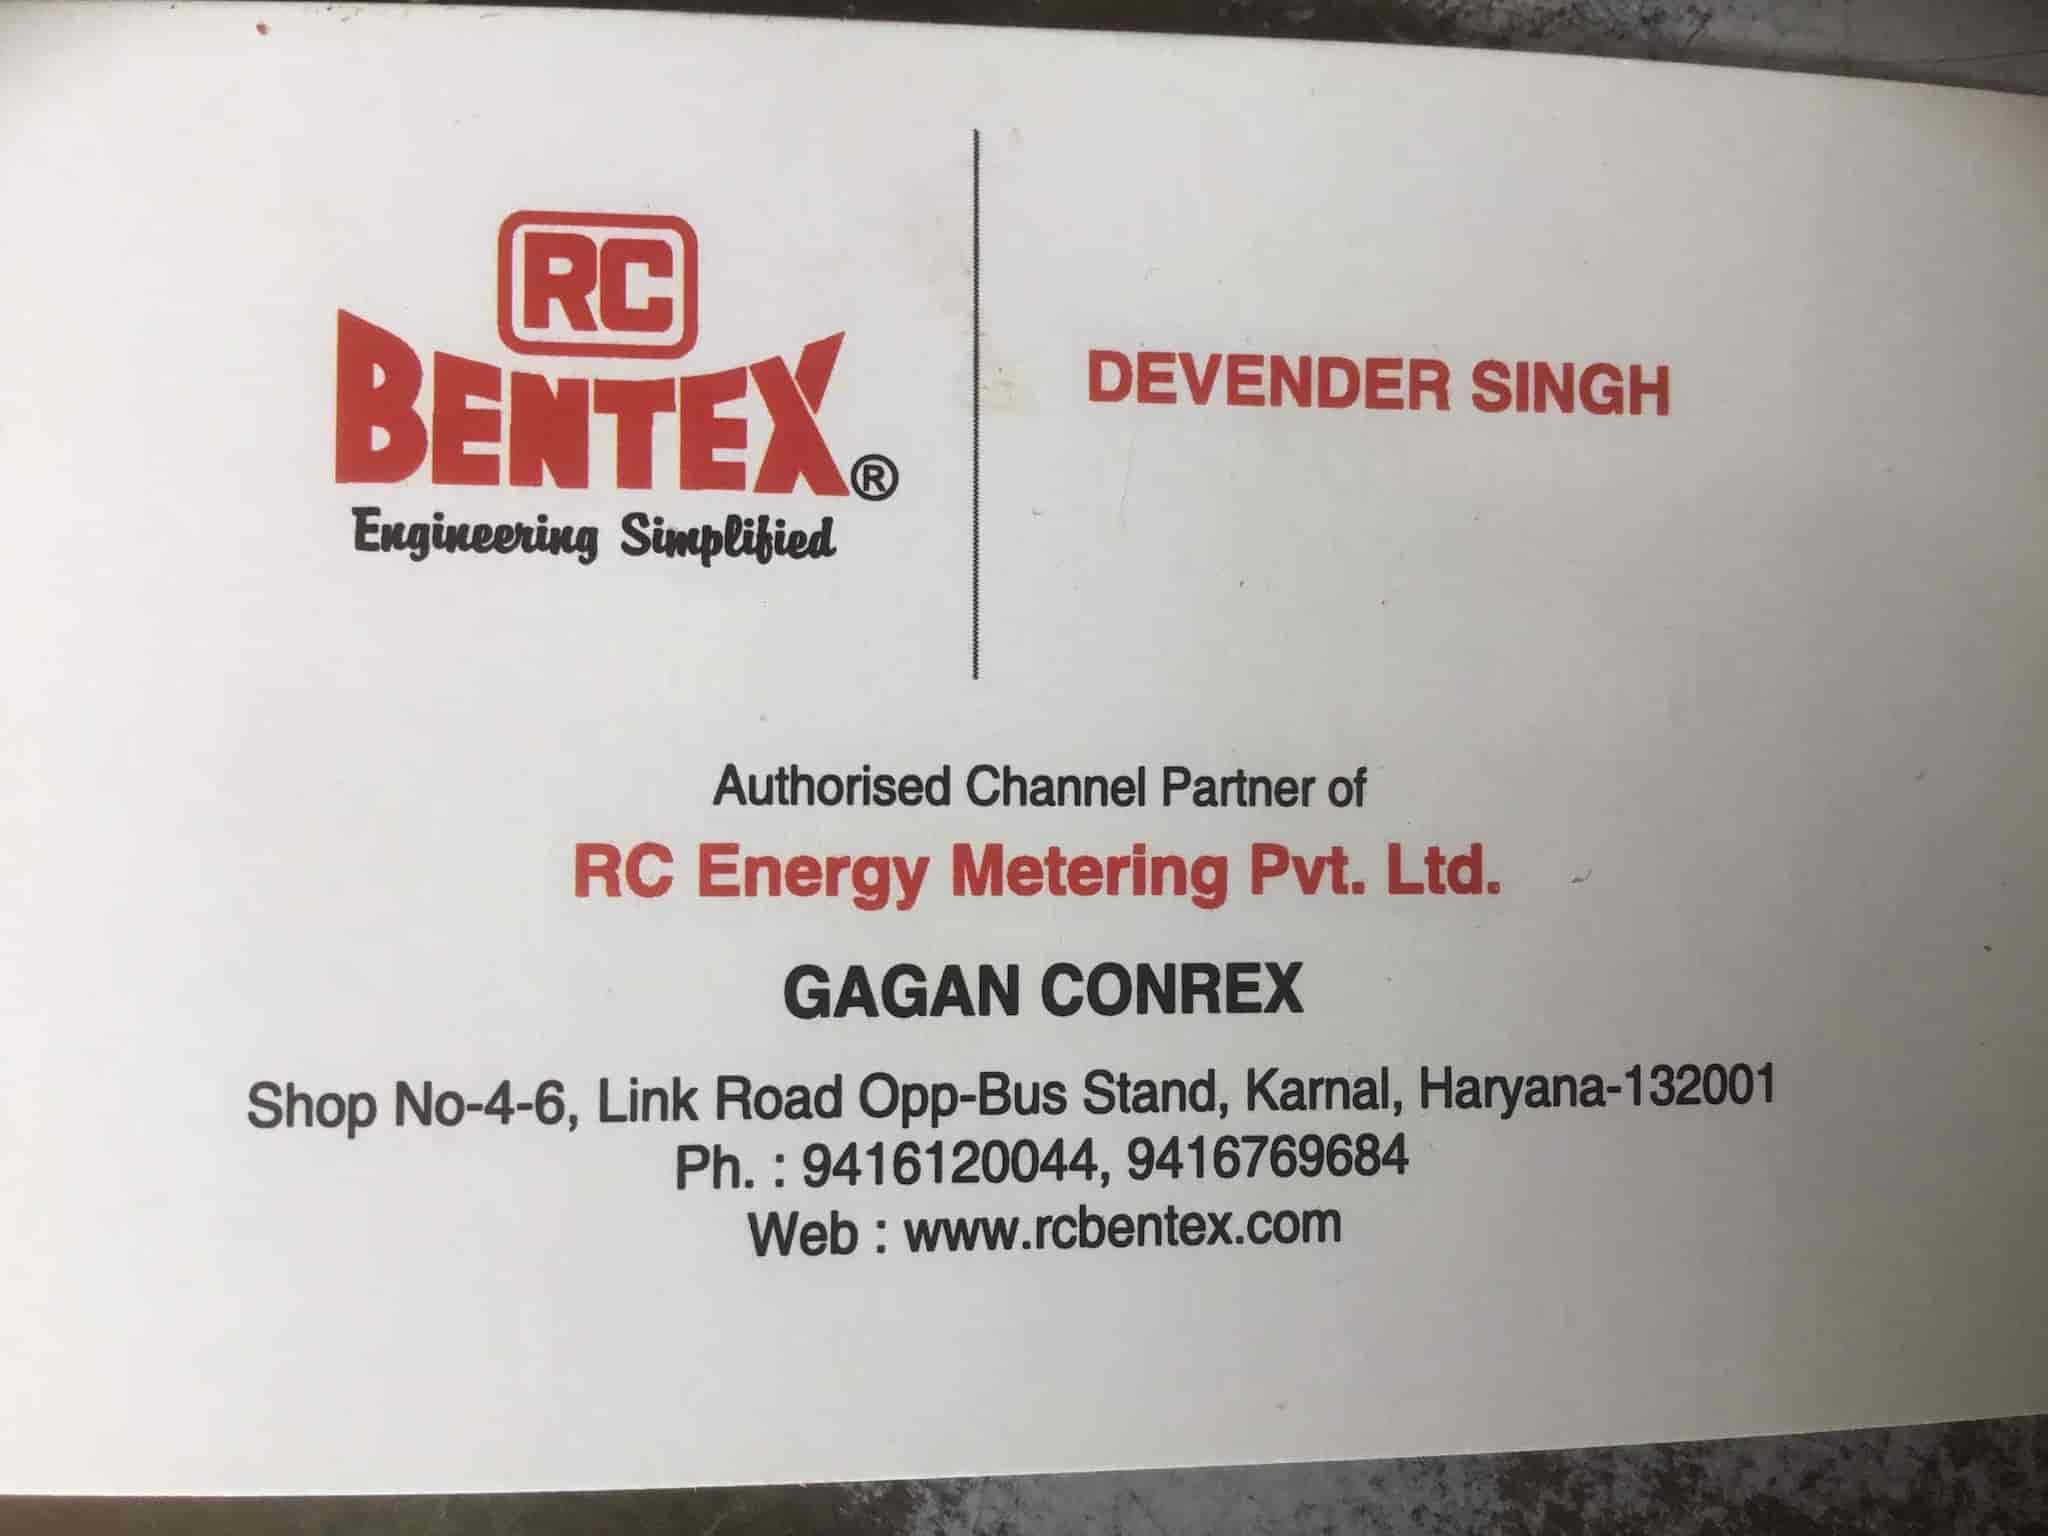 Gagan Conrex Photos, HBC, Karnal- Pictures & Images Gallery - Justdial